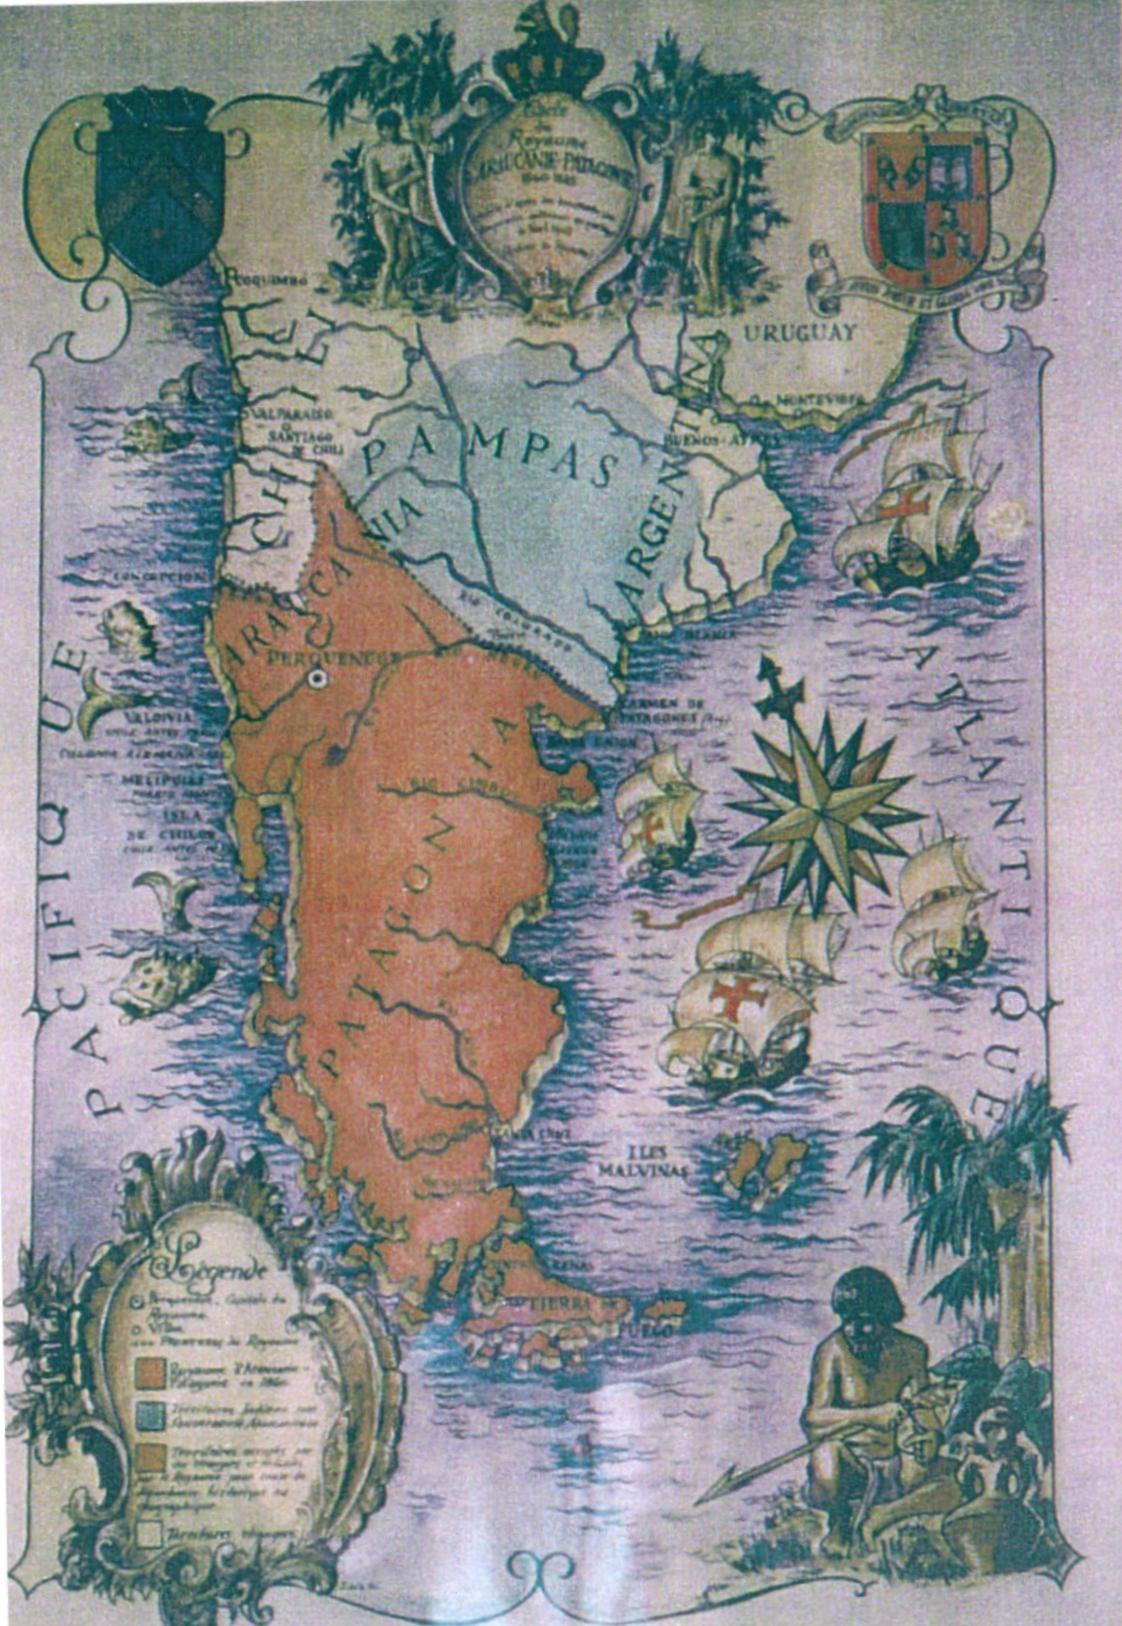 Patagonia Cartina Geografica.Patagonia Y Araucania Geografia Carte Geografiche